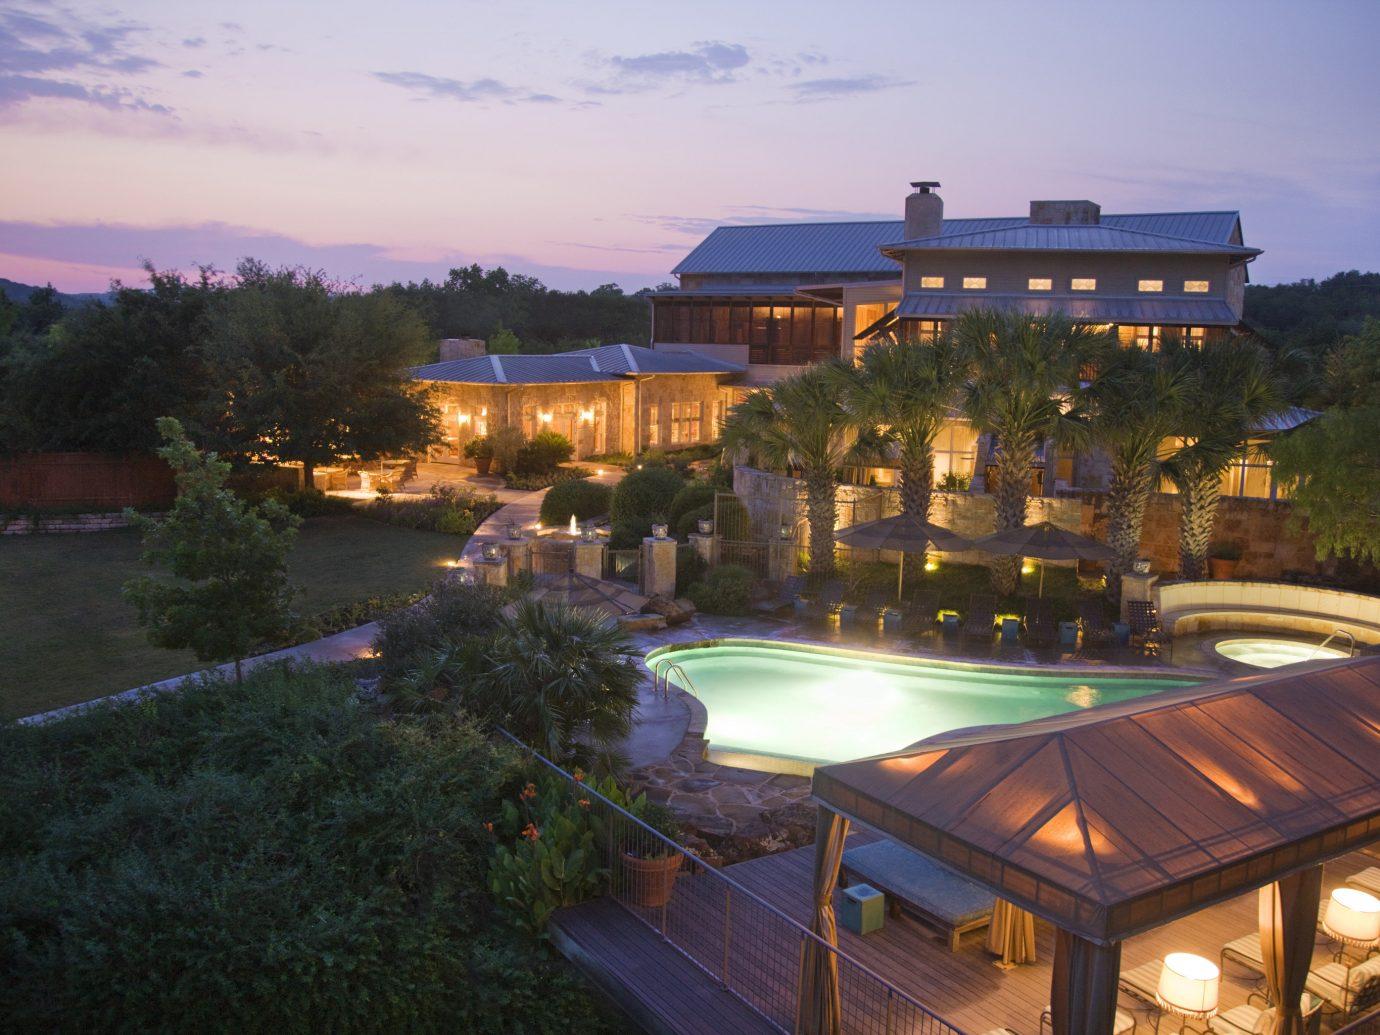 Hotels sky outdoor tree property swimming pool estate Resort Villa mansion light day